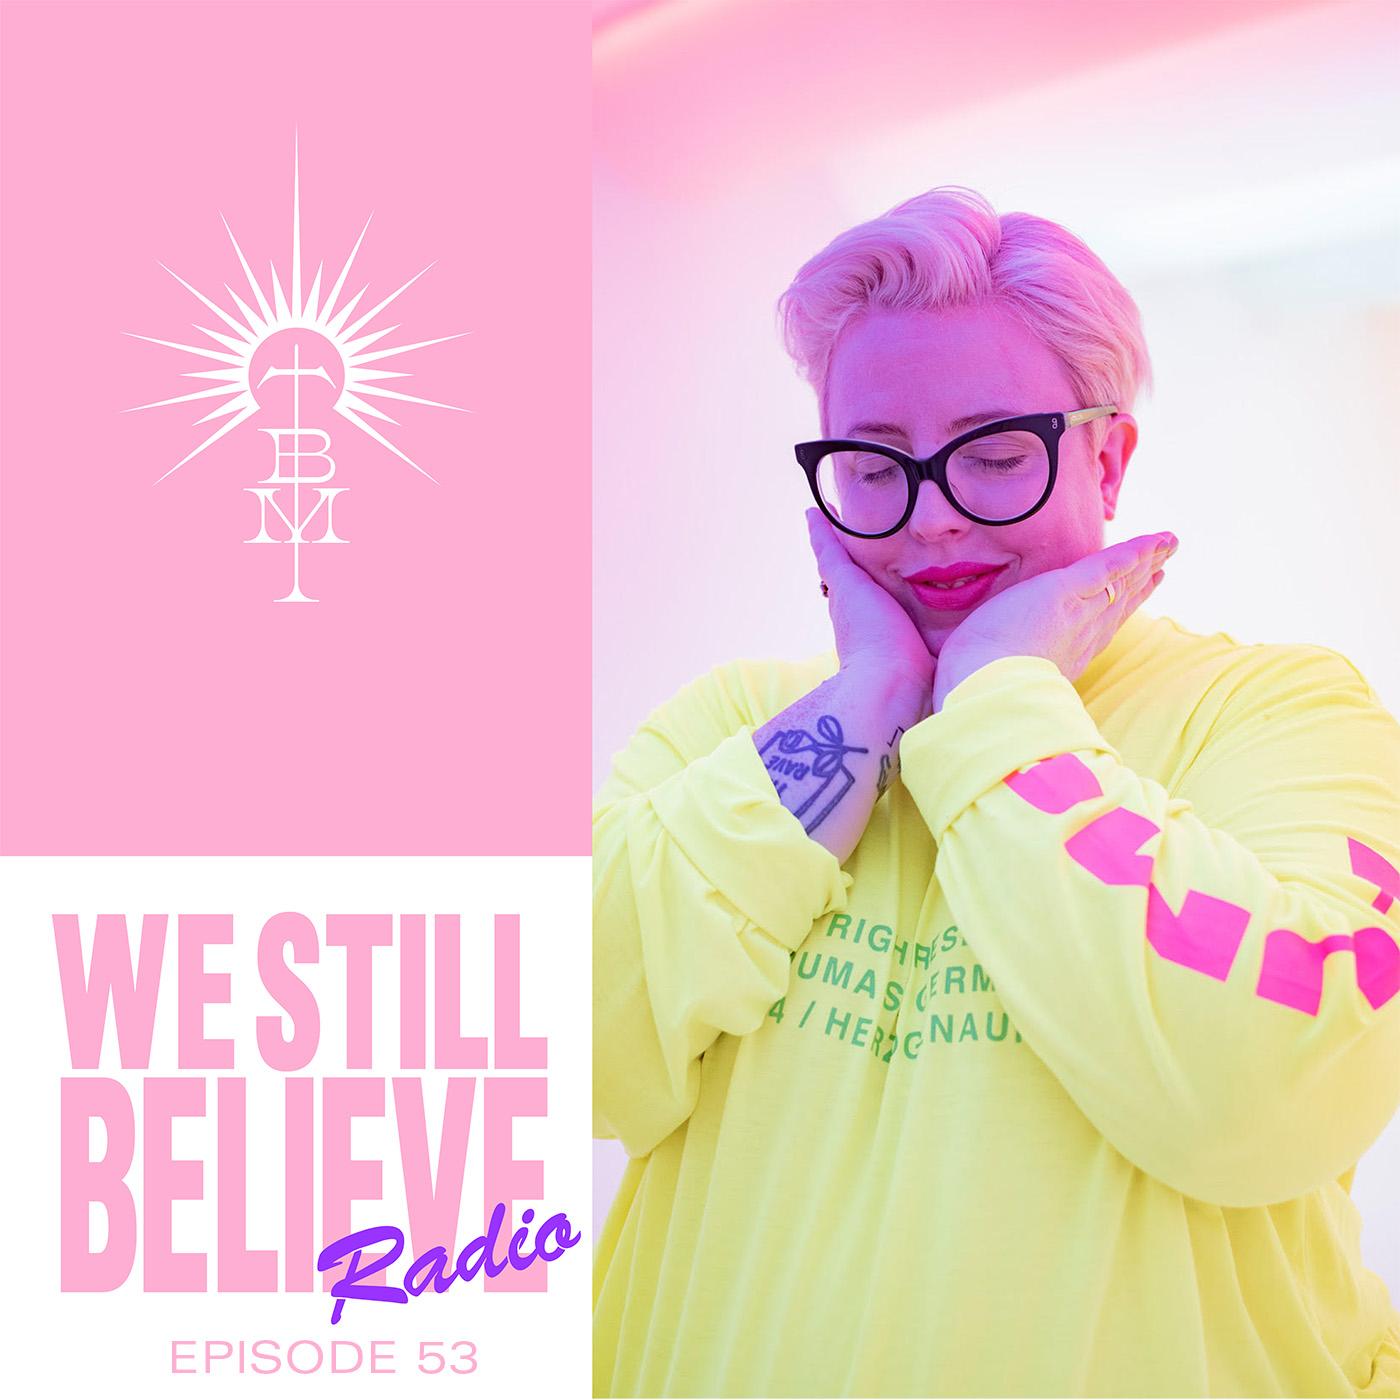 We Still Believe - Episode 053 - WBMX Mixtape Special